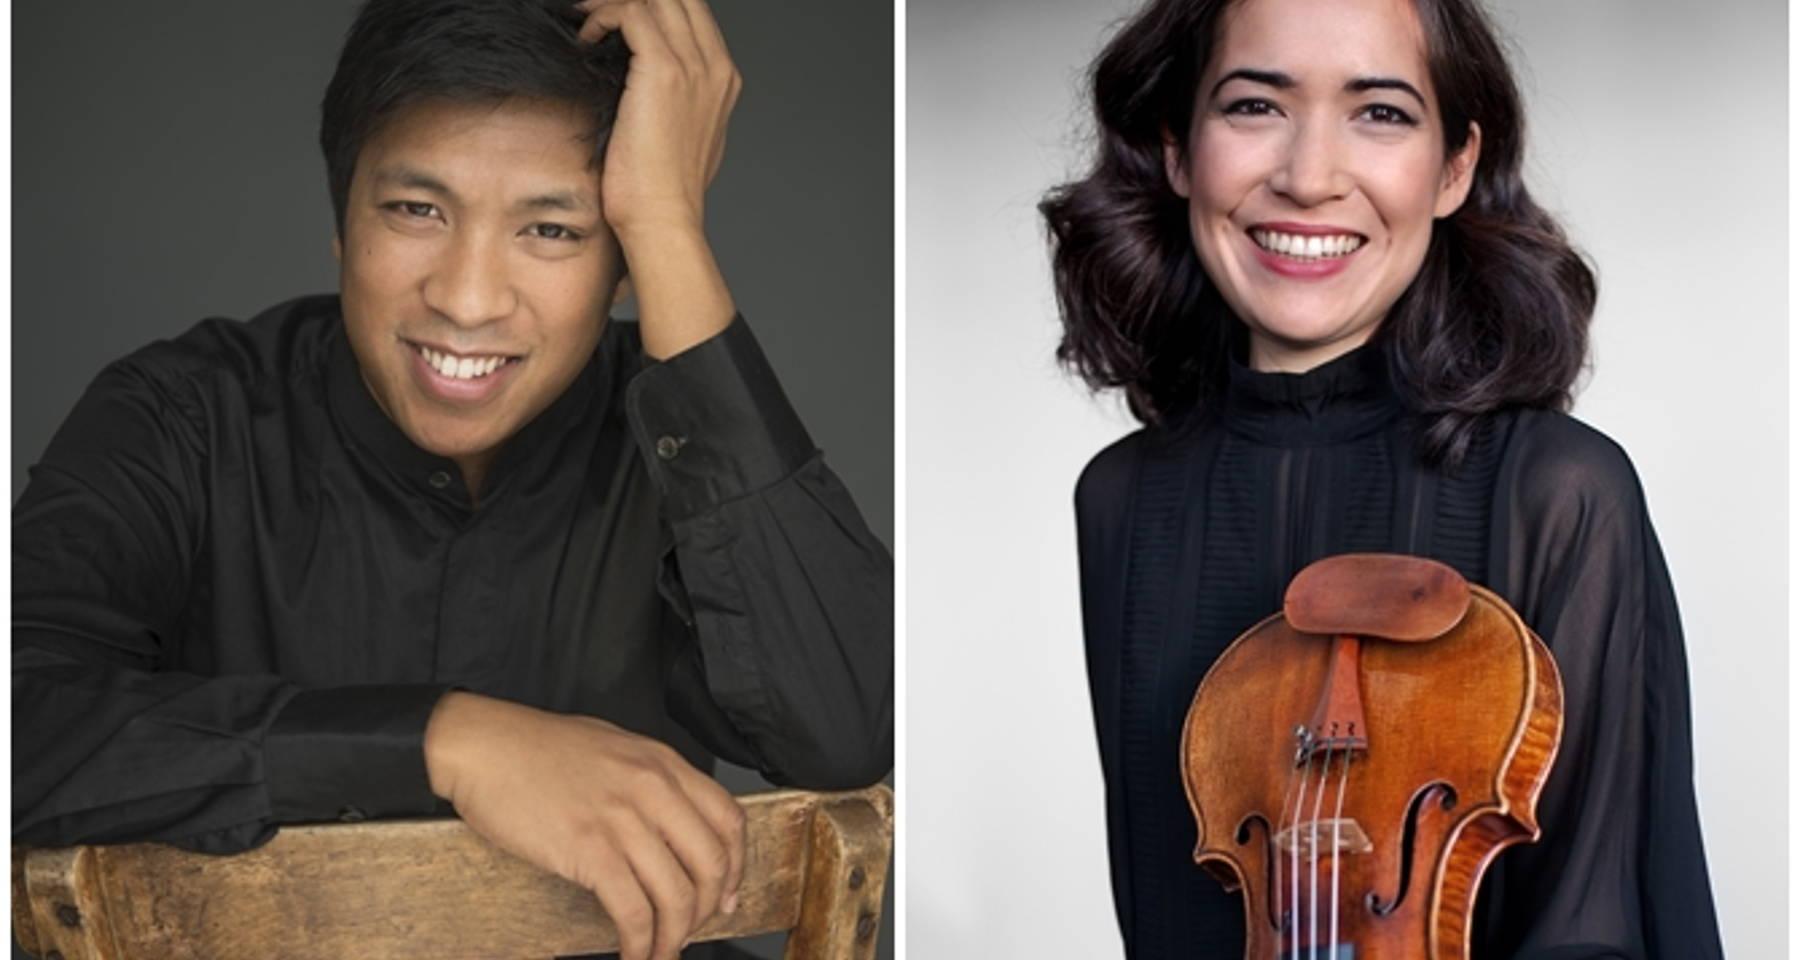 Yannick and Friends present : Violinist Viviane Hagner Live from Bechstein Showroom in Berlin